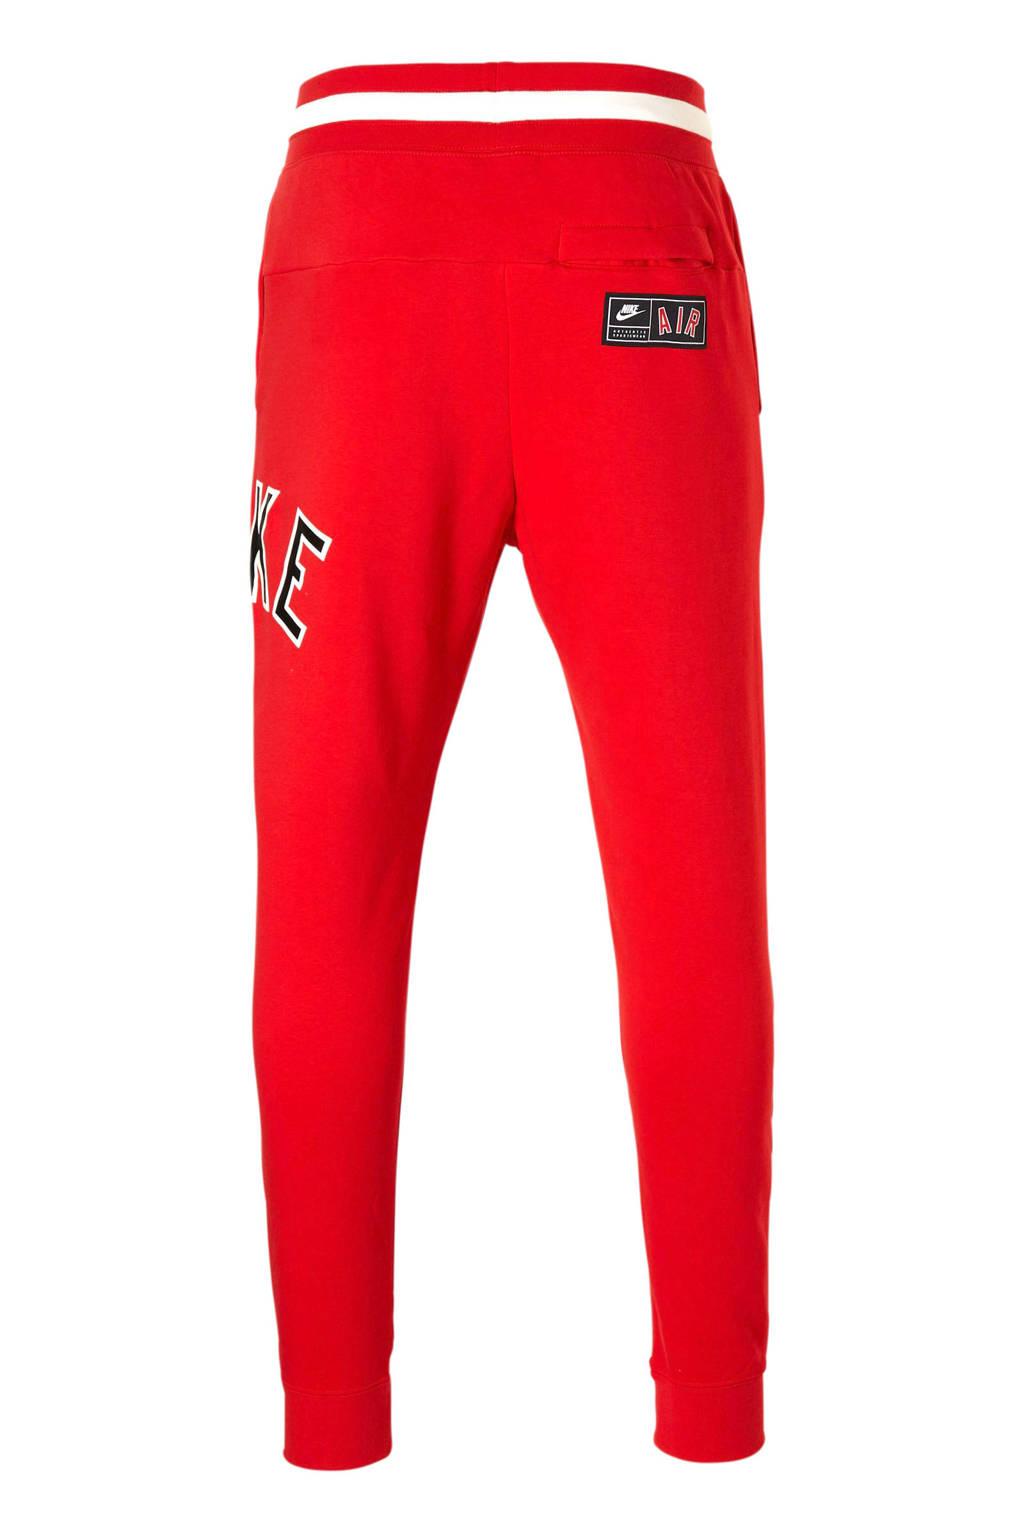 Joggingbroek Rood.Nike Joggingbroek Rood Wehkamp